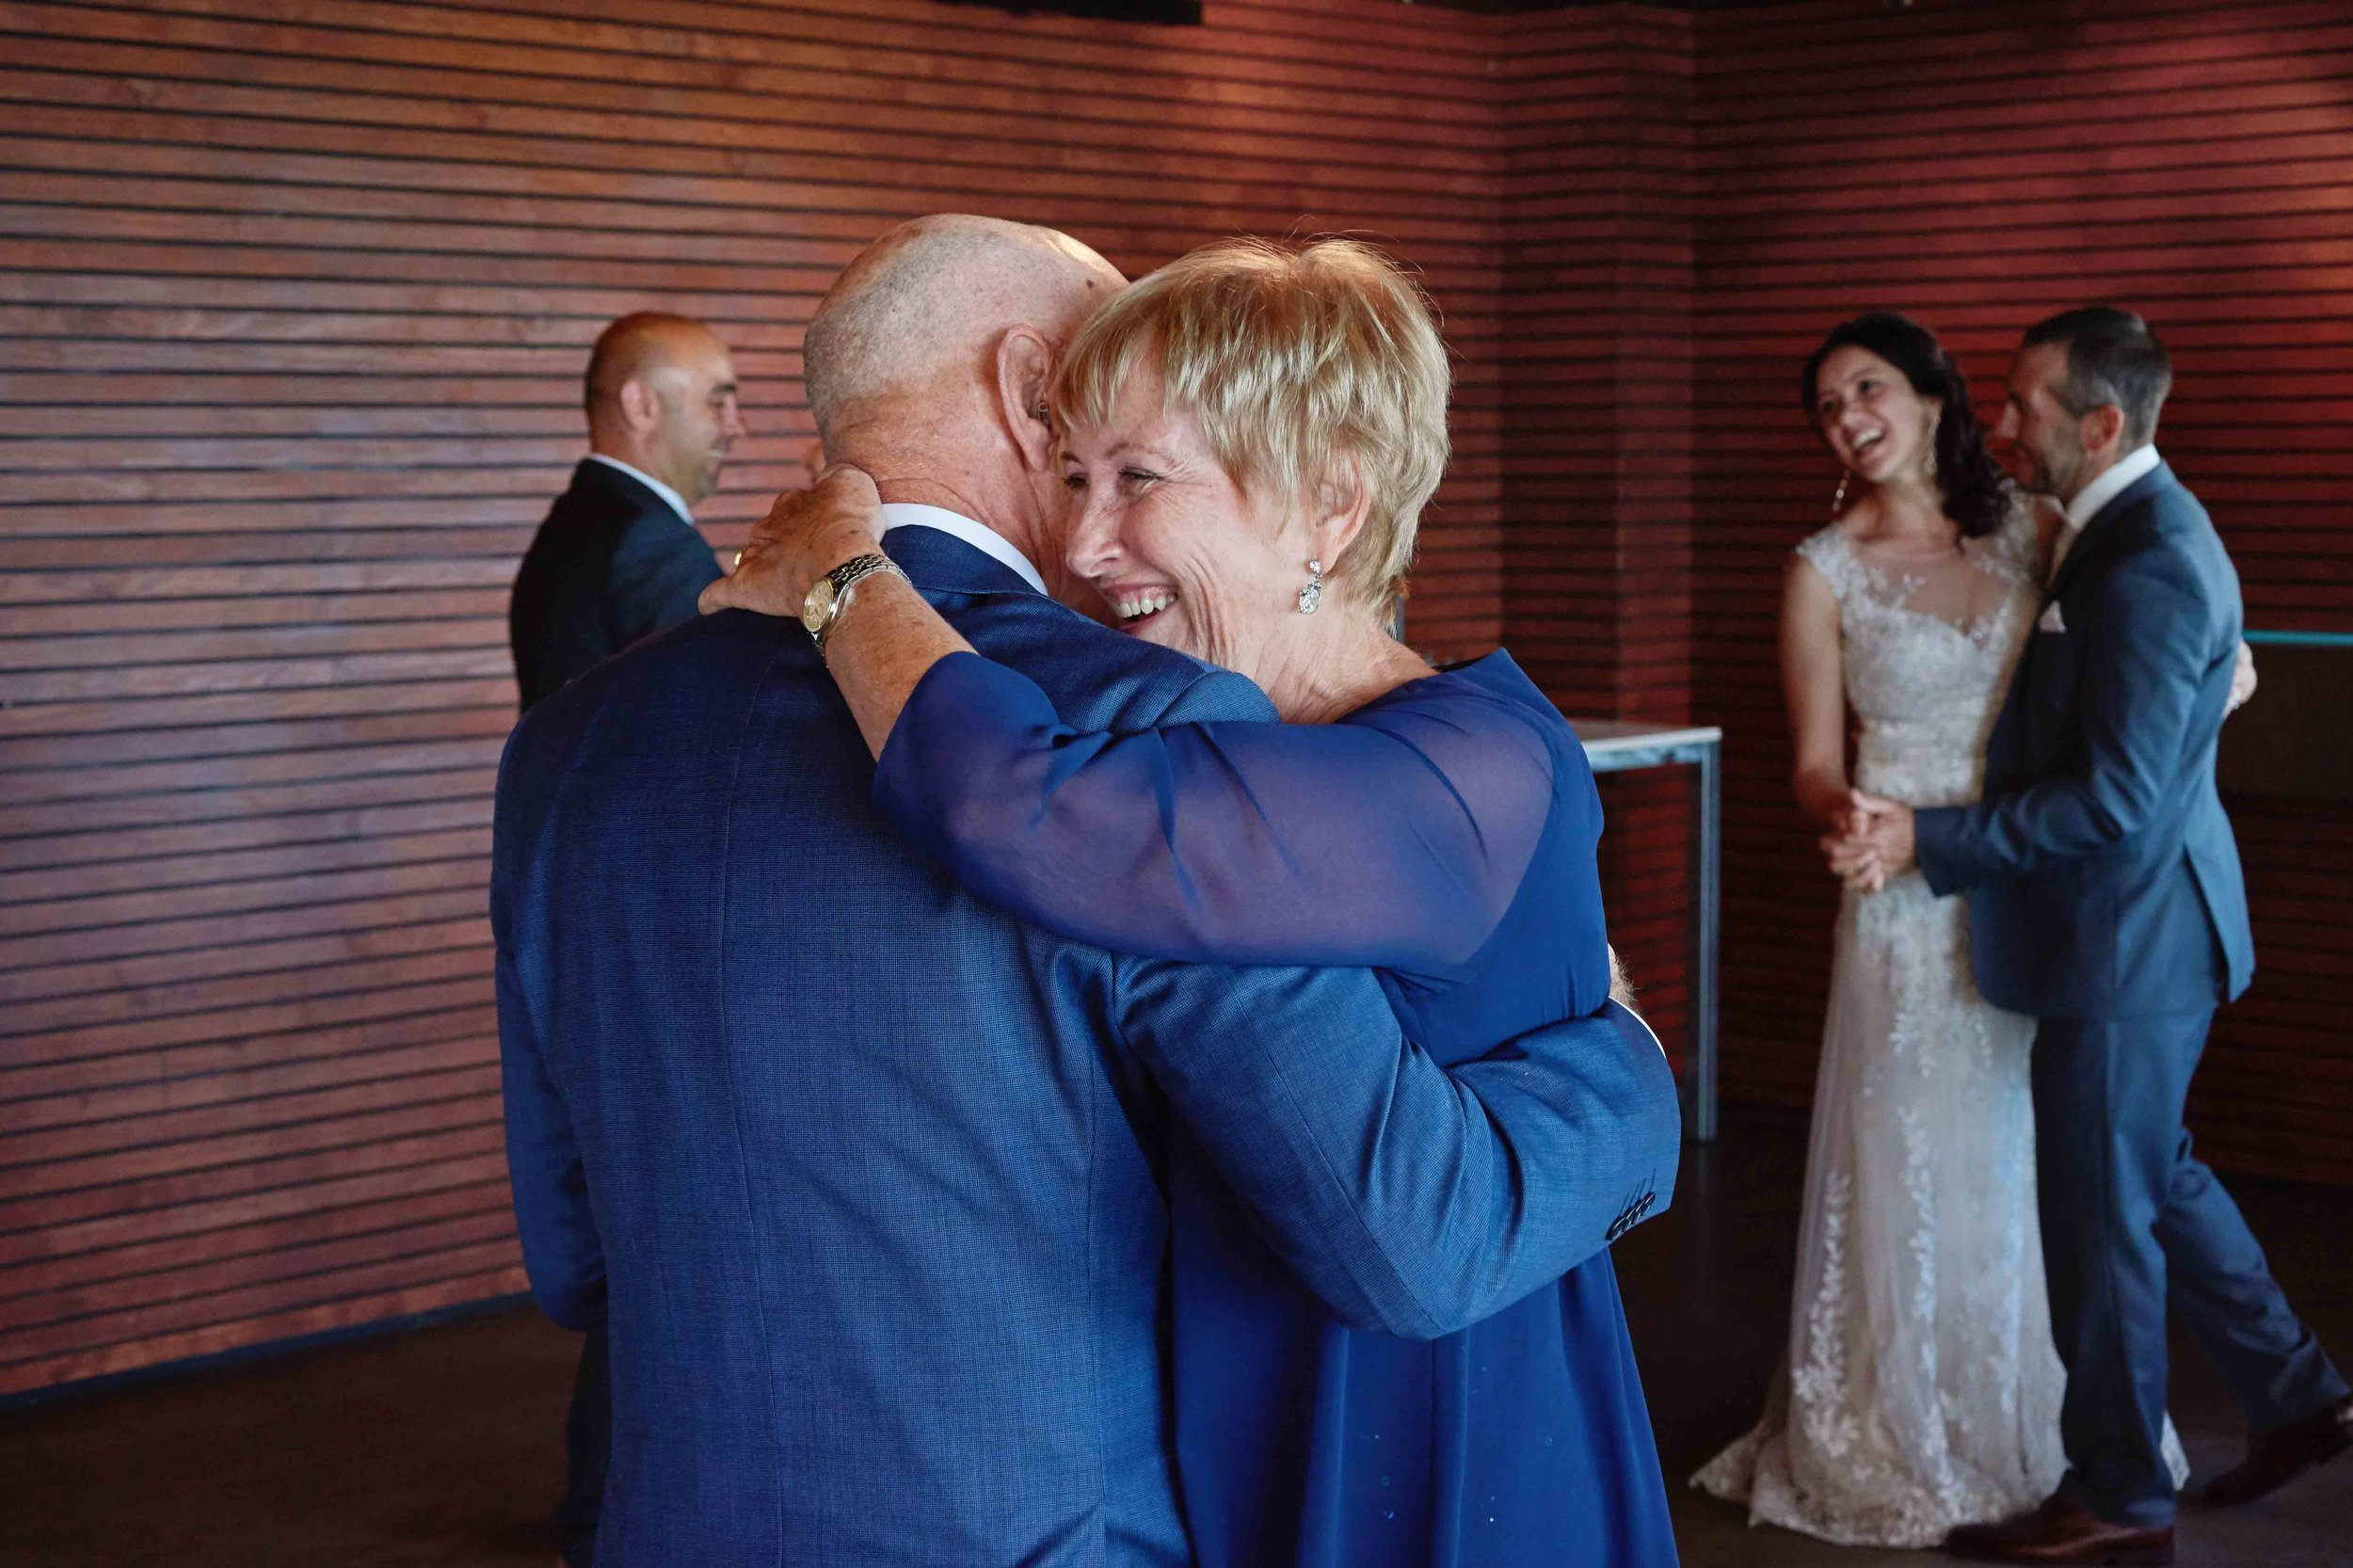 sorrento-wedding-photography-all-smiles-marissa-jade-photography-78.jpg